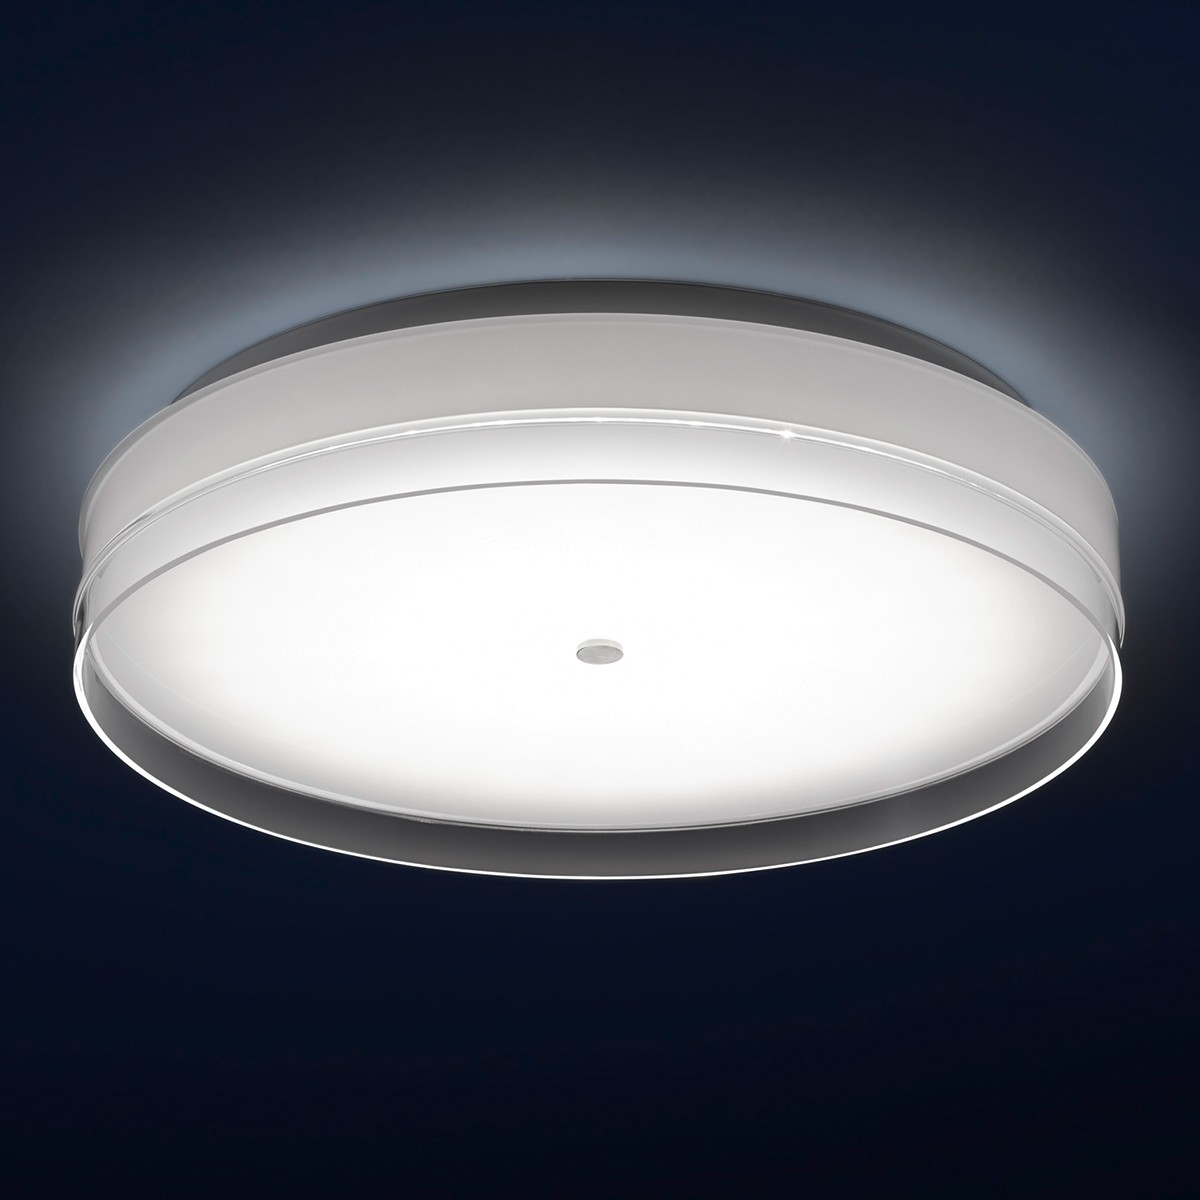 Helestra Yuma Wand- / Deckenleuchte, Ø: 40 cm, Opalglas / klarer Dekorrand